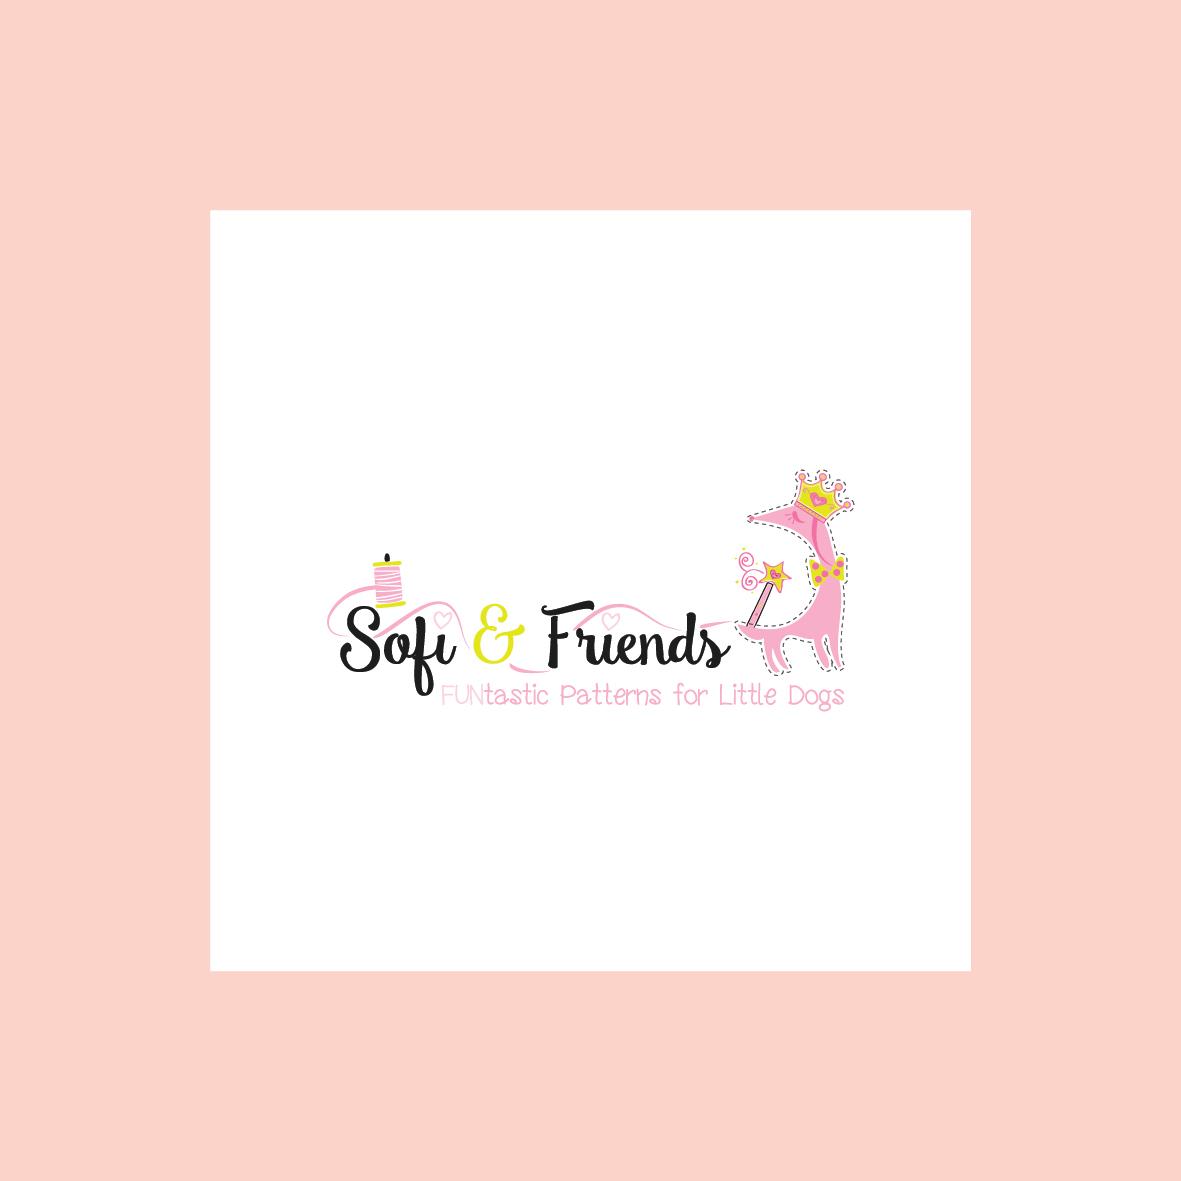 sofi & friends logo design studio grafico salerno